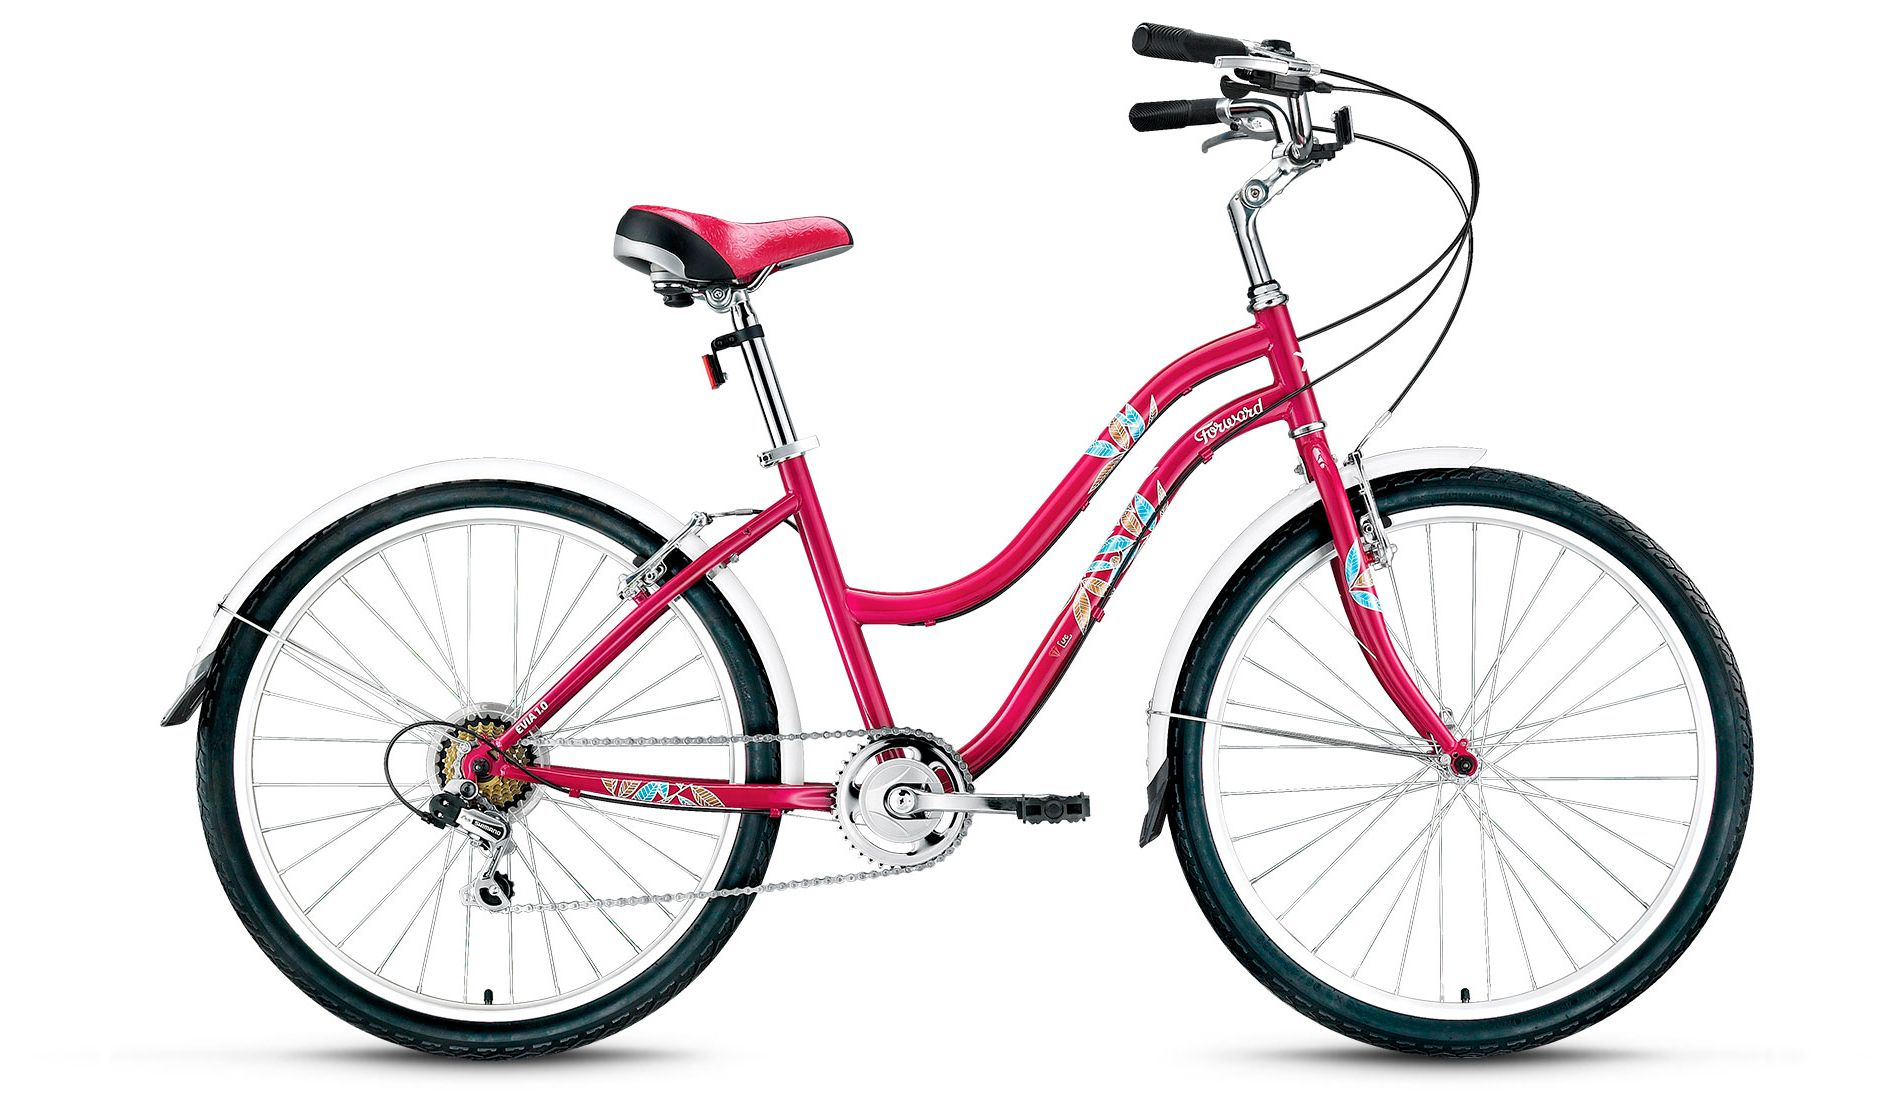 Велосипед Forward Evia 26 1.0 2017,  Женские  - артикул:279875